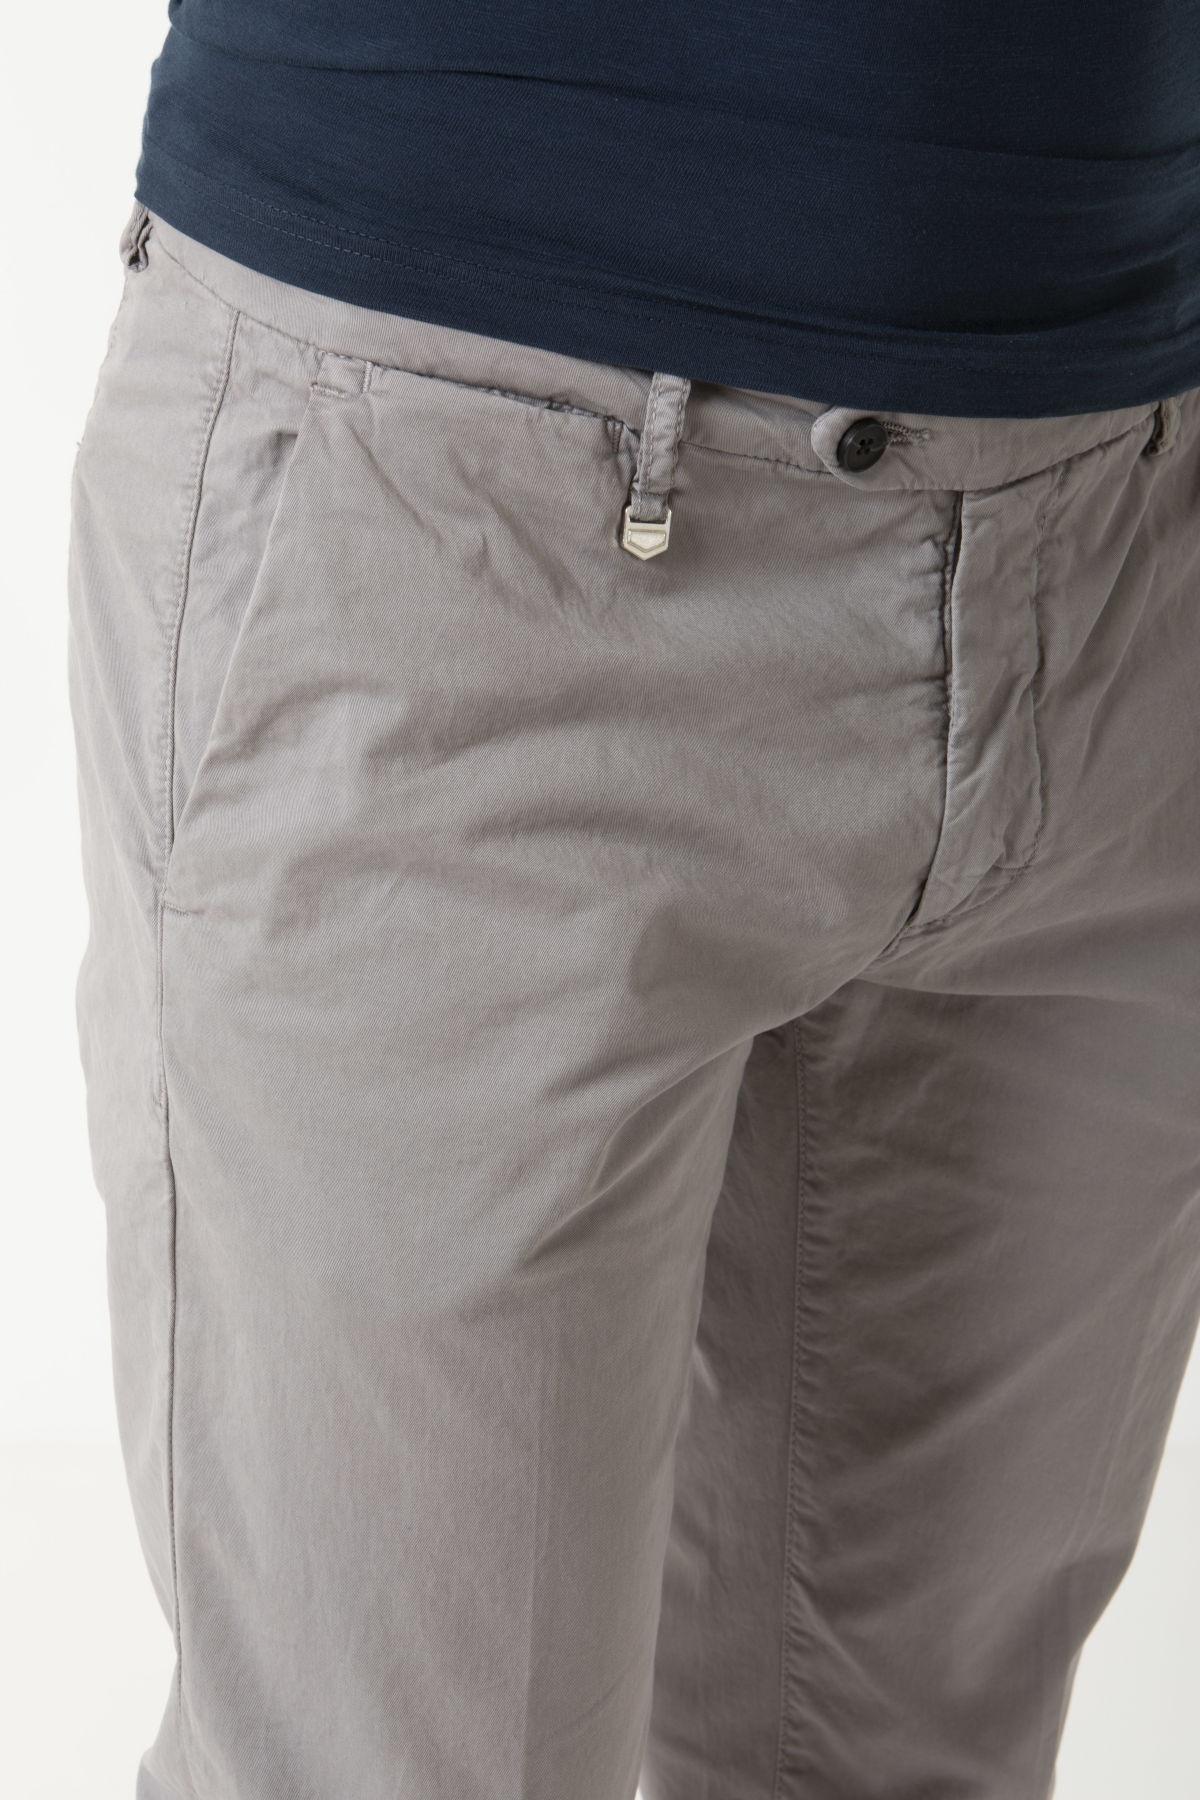 Pantaloni BRYAN per uomo ANTONY MORATO P/E 19